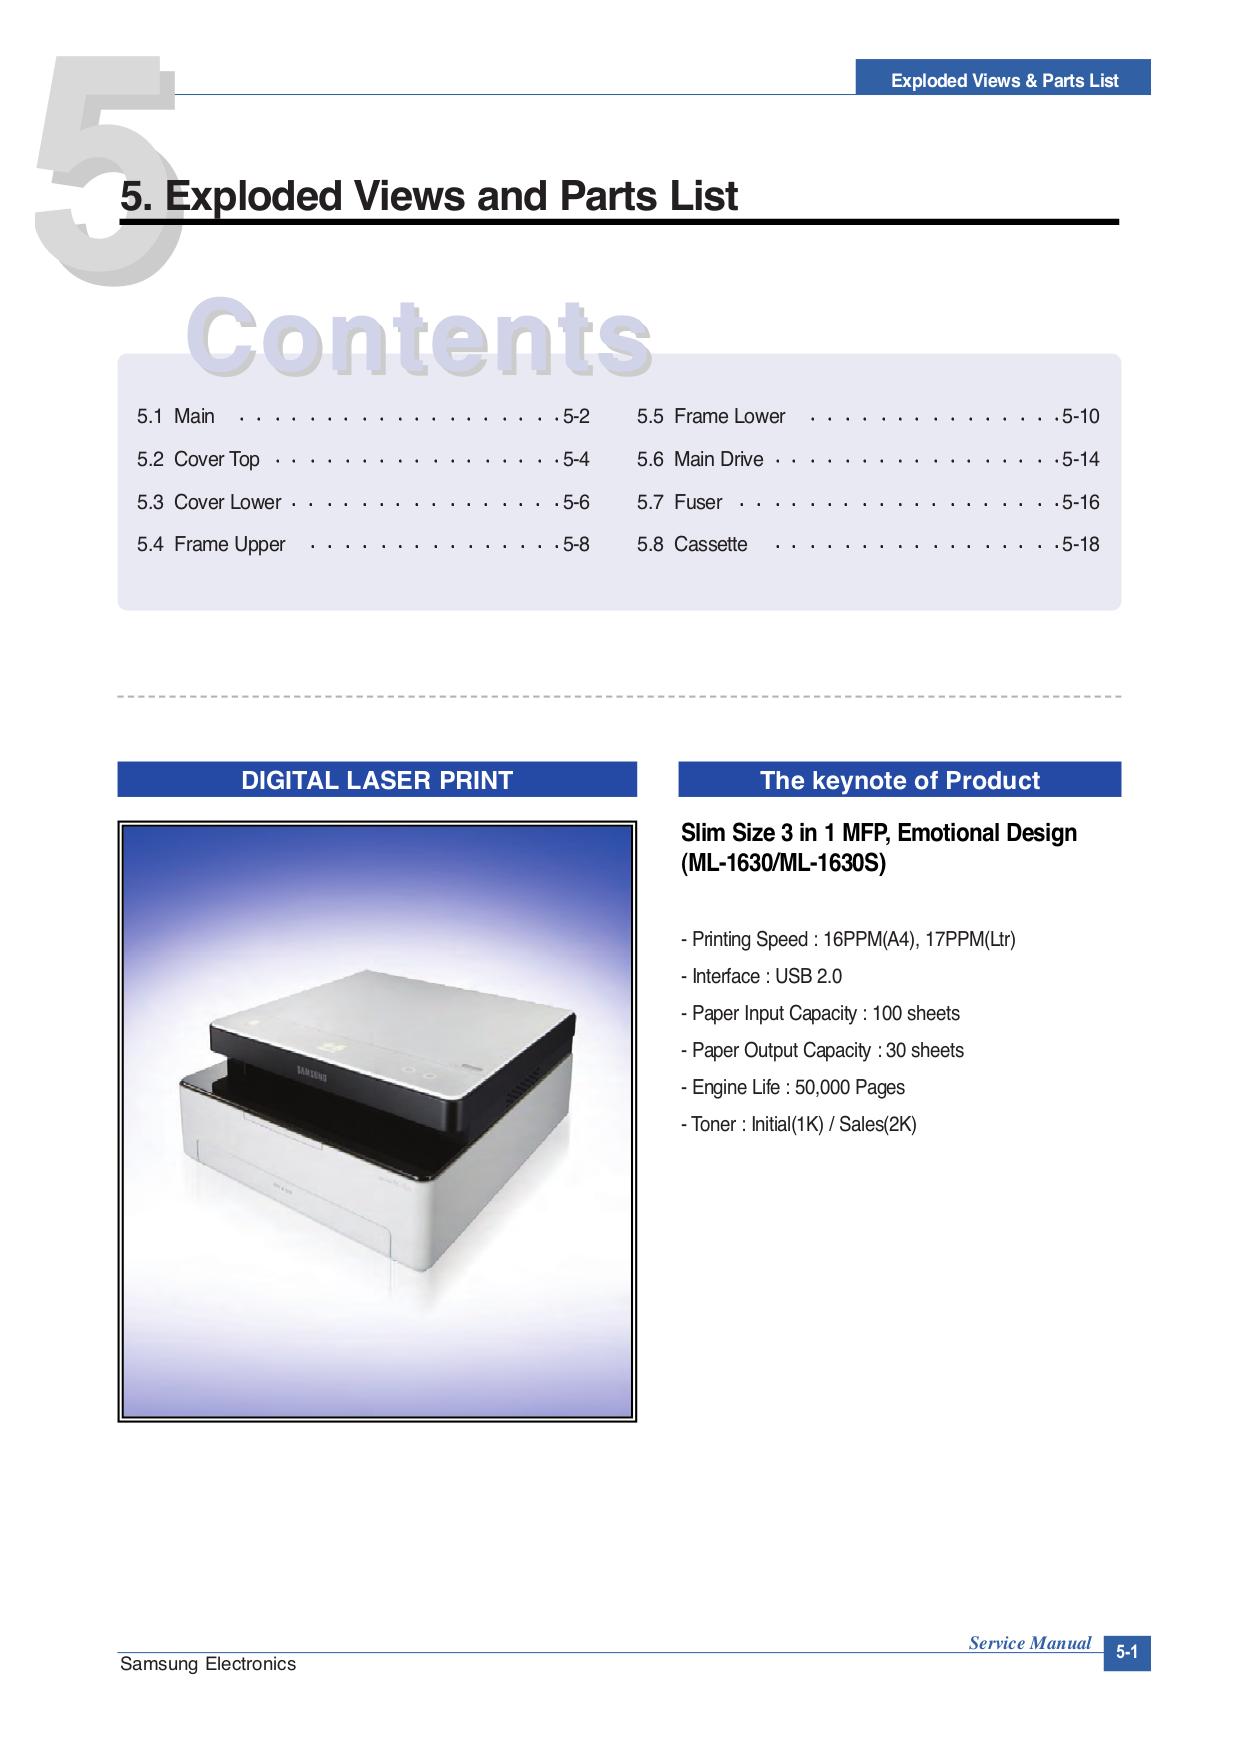 pdf manual for samsung printer ml 1630w rh umlib com Samsung Galaxy S Manual Verizon Samsung Flip Phone Manual